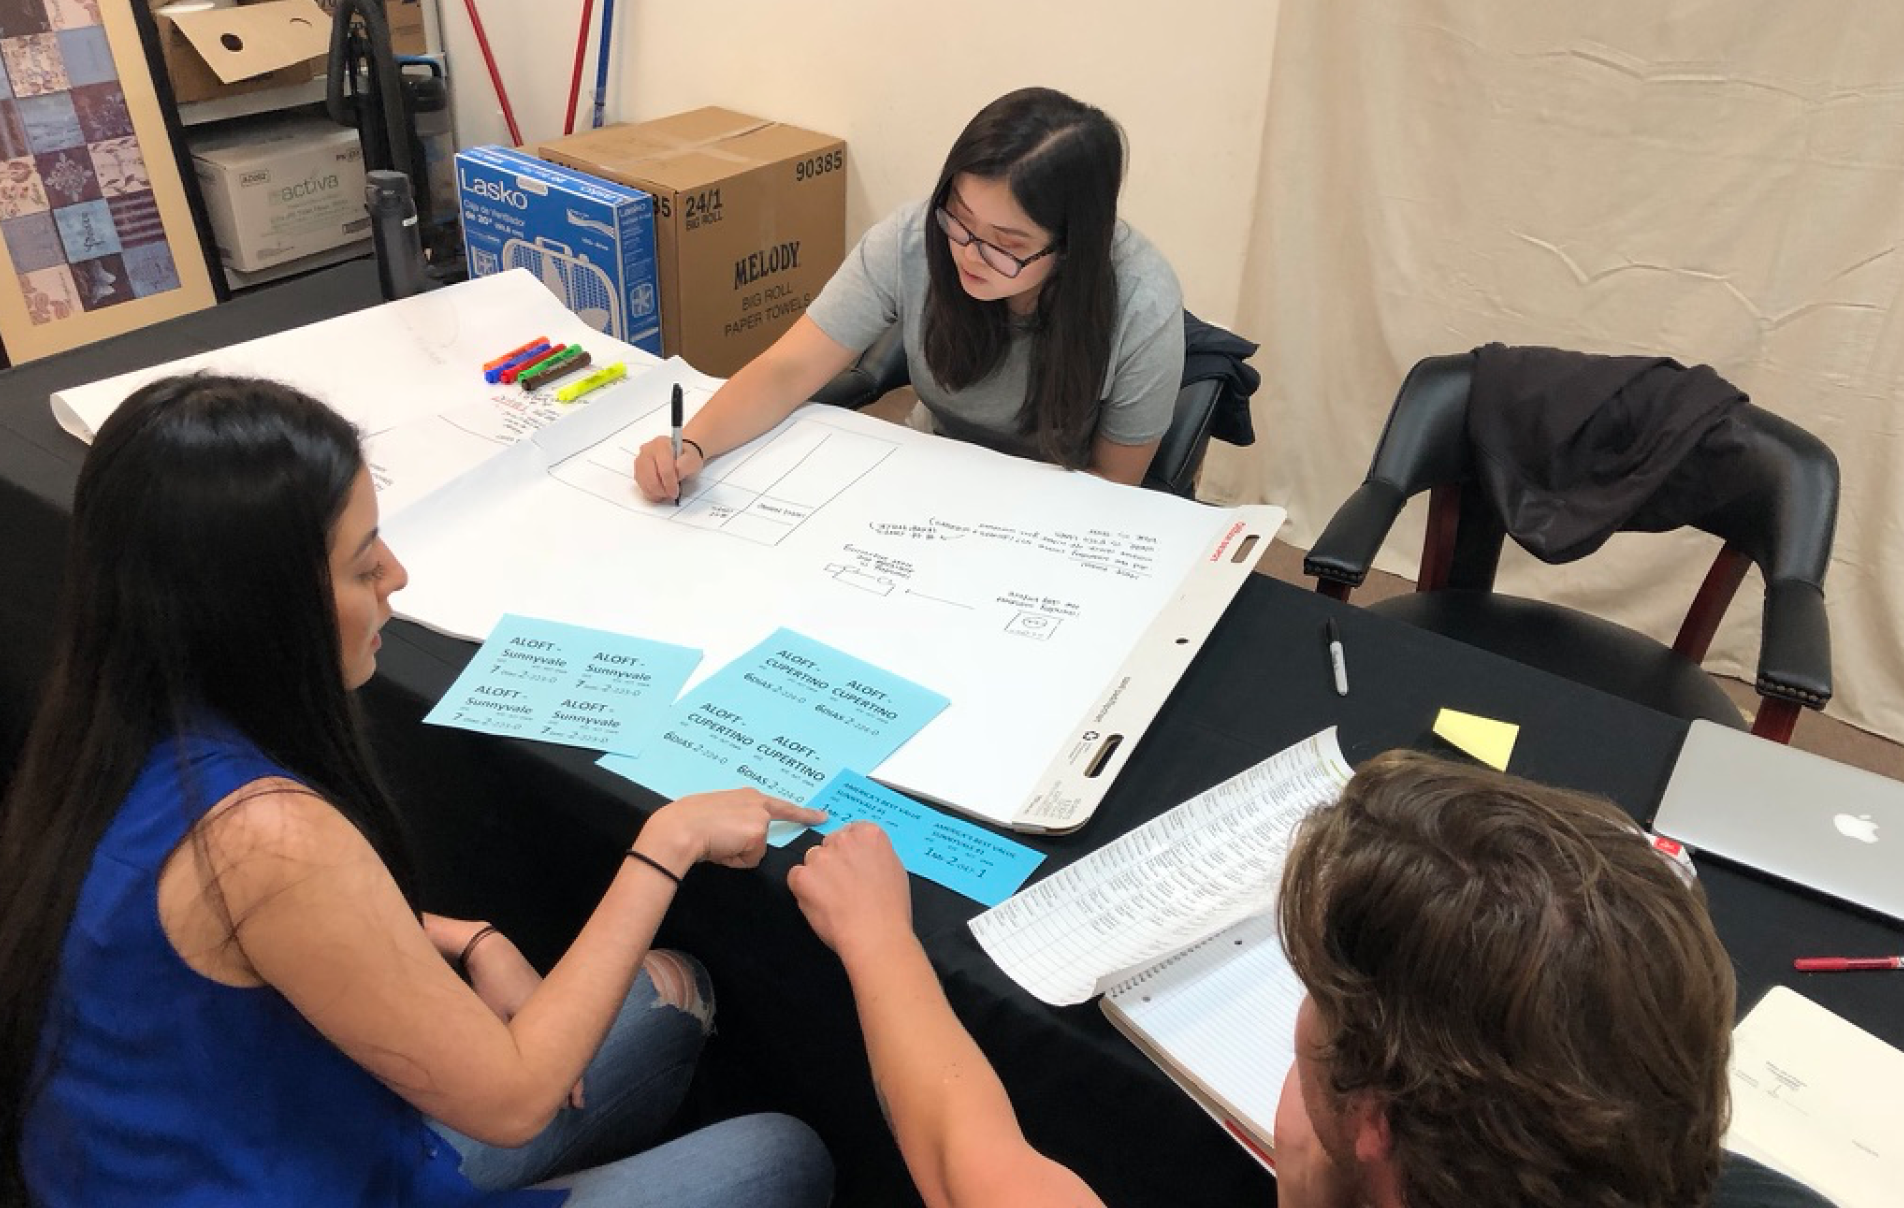 Joanna brainstorms prototypes to improve internal communication